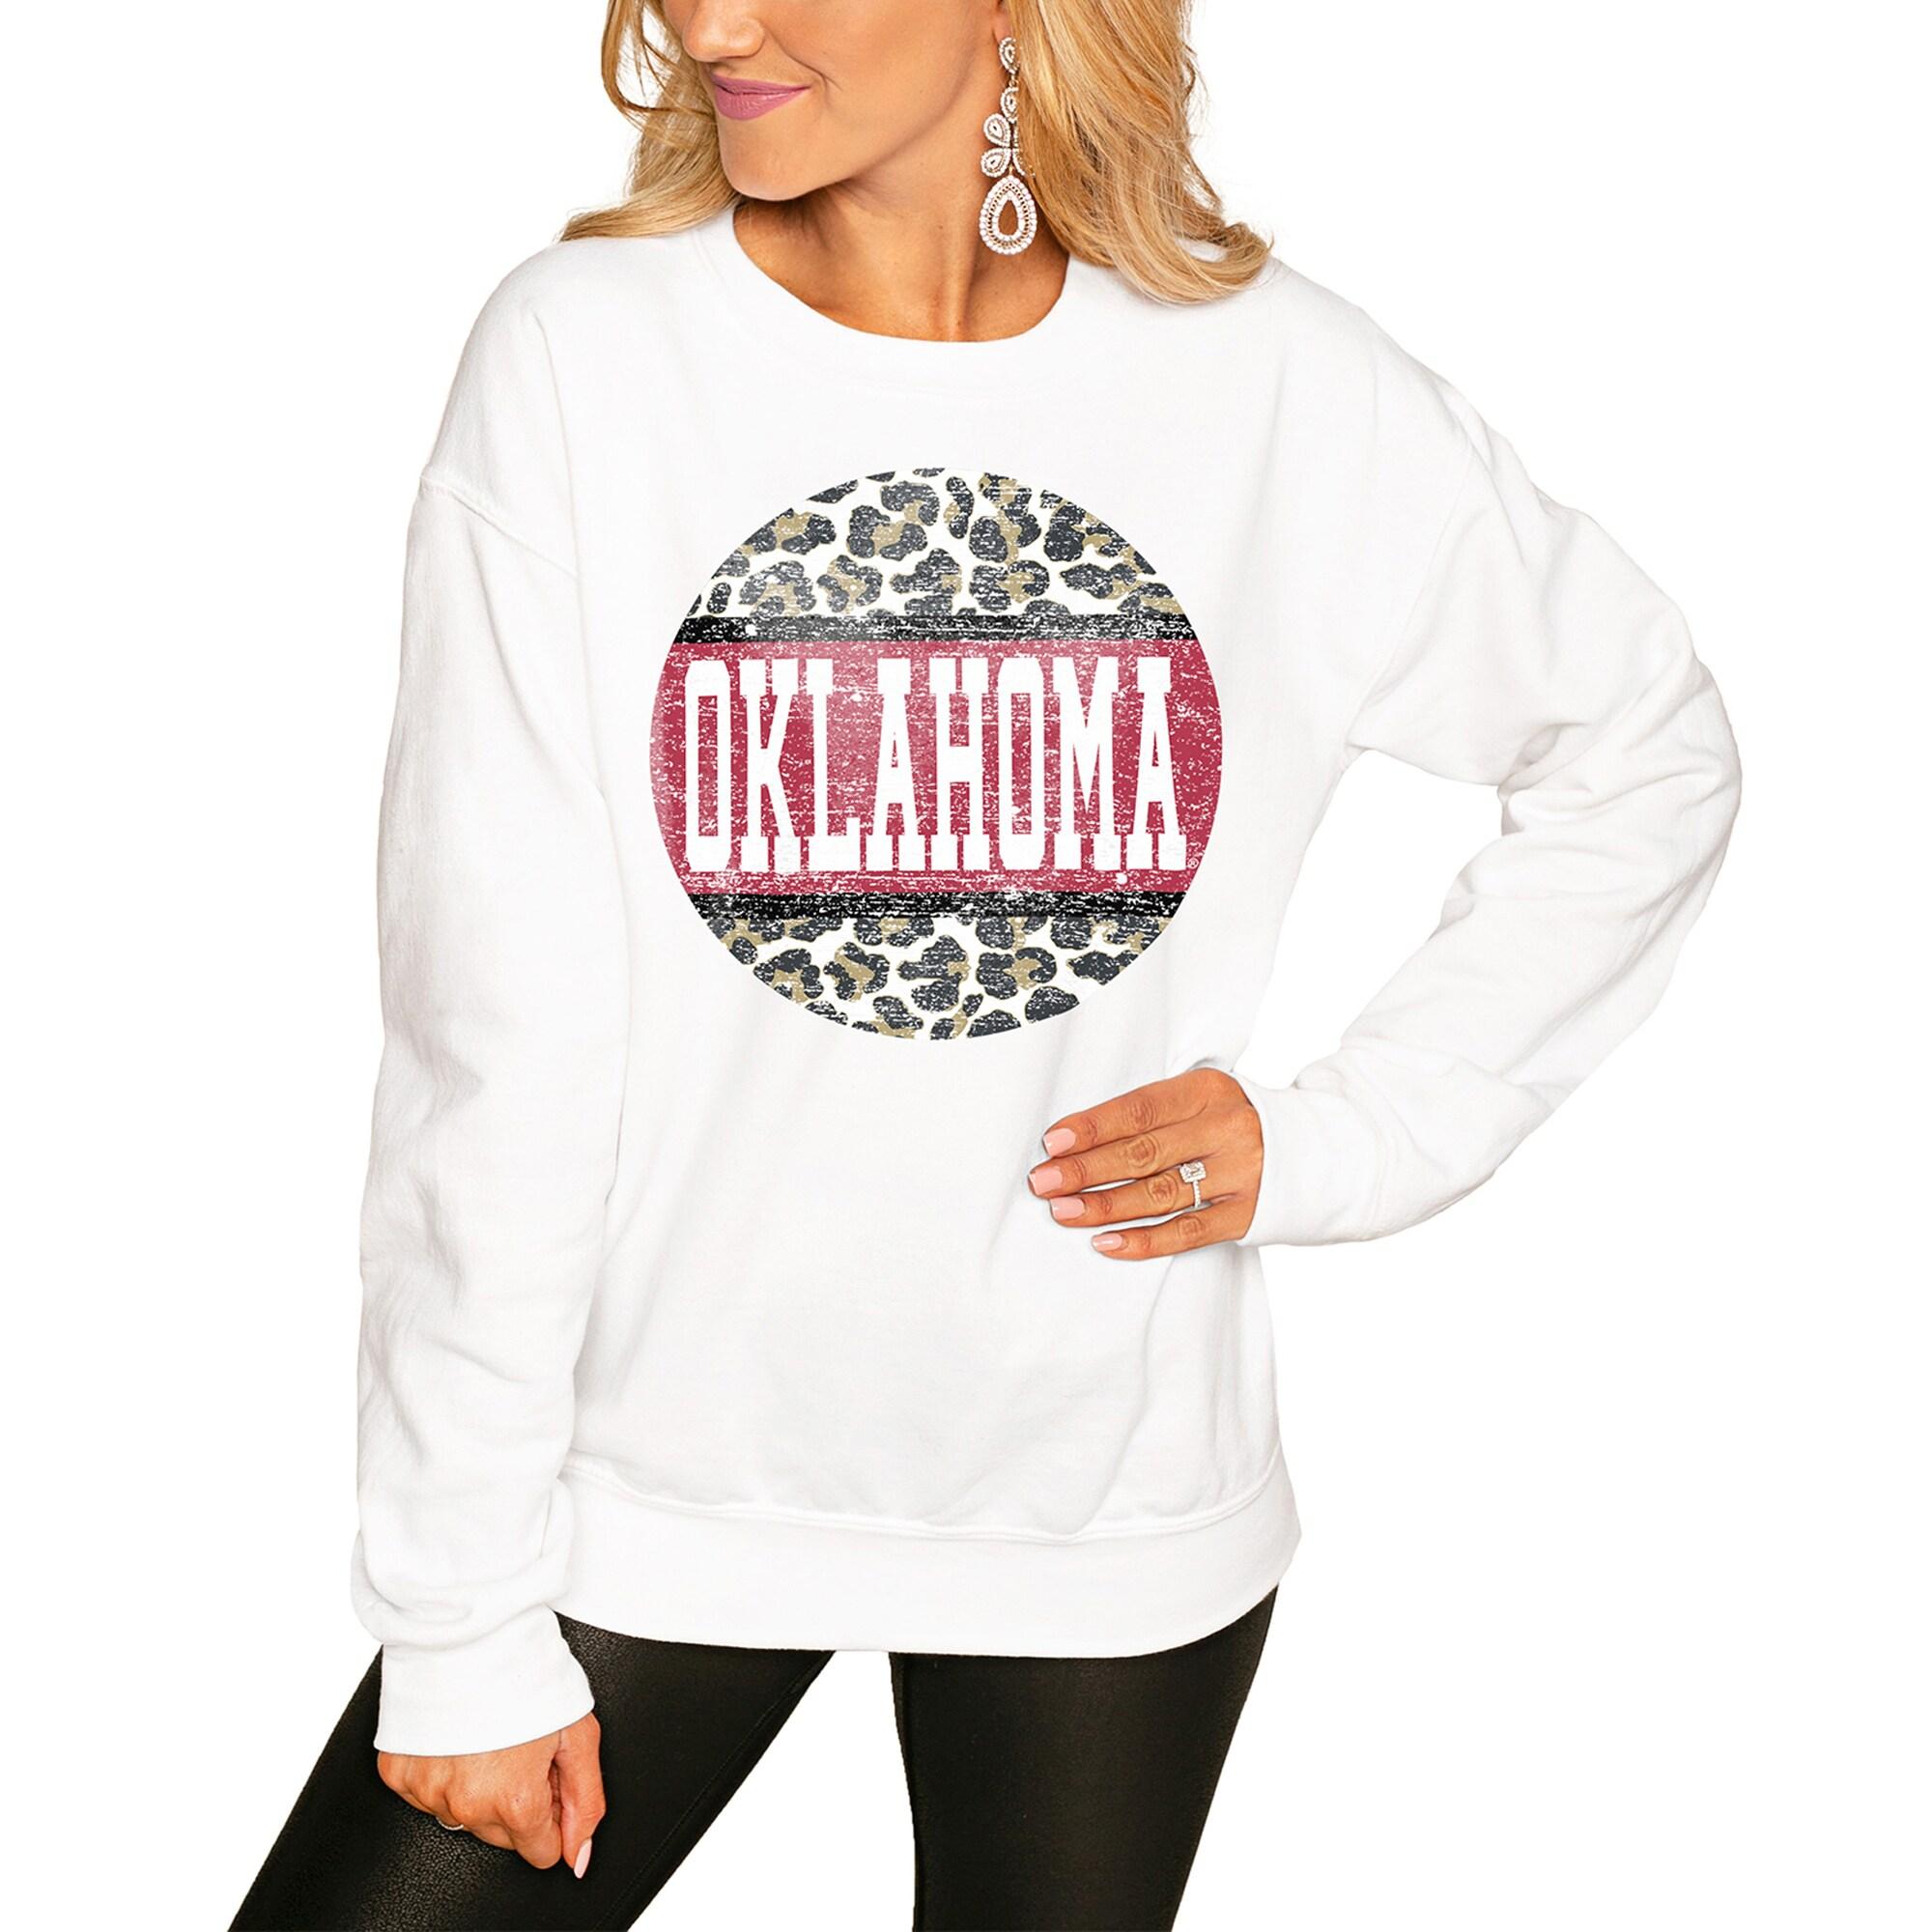 Oklahoma Sooners Women's Scoop & Score Pullover Sweatshirt - White